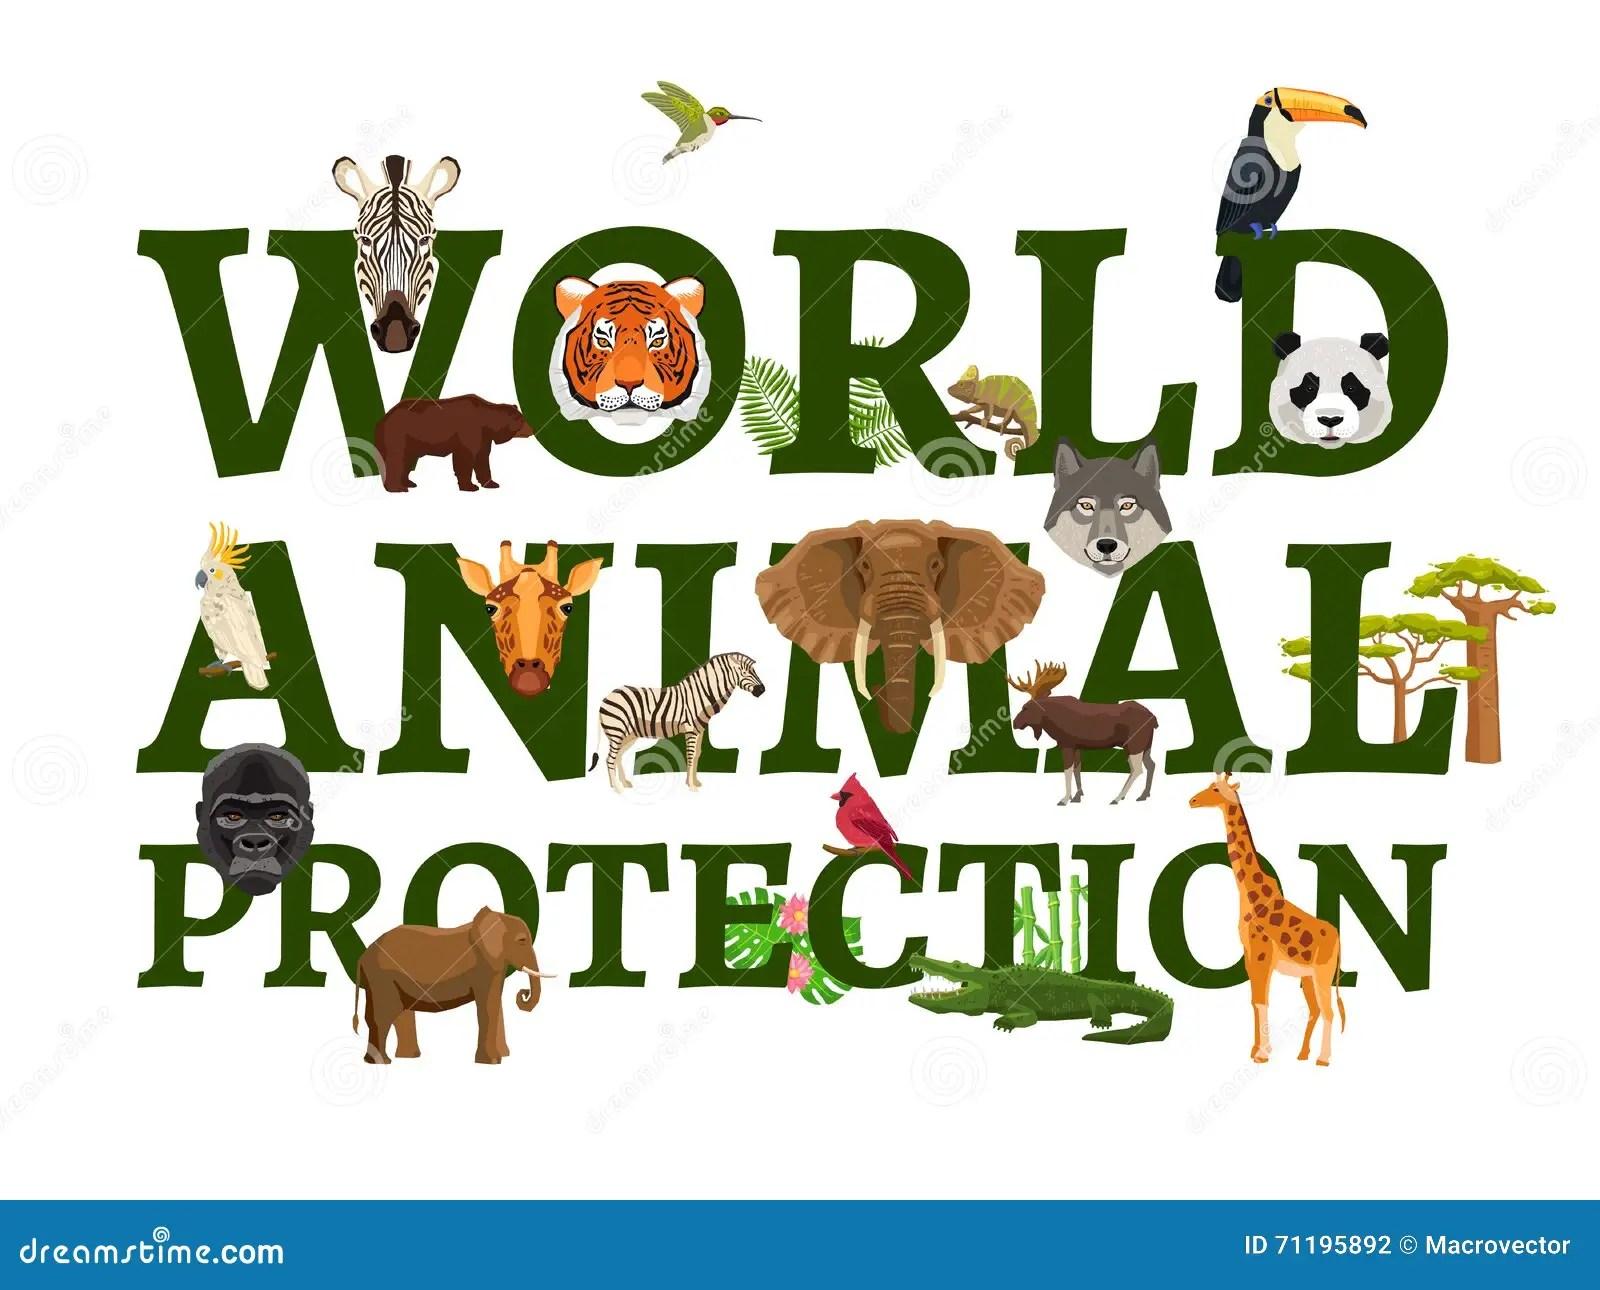 Red Animal Print Wallpaper Wild Animal Protection Illustration Vector Illustration